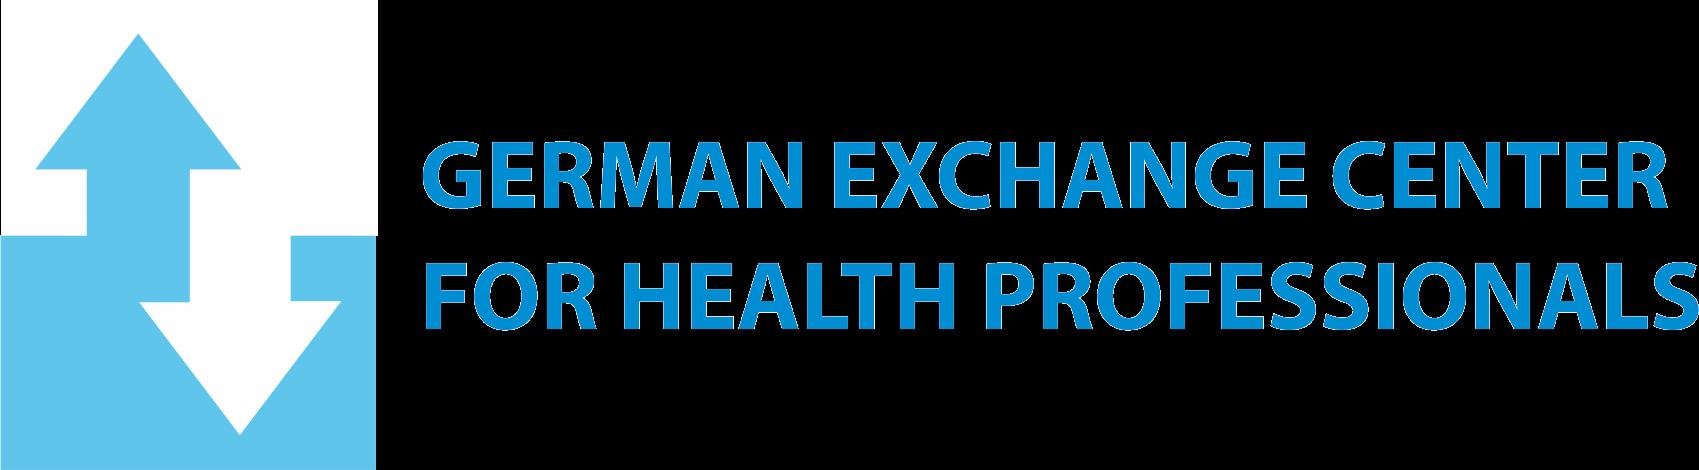 German Exchange Center for Health Professionals